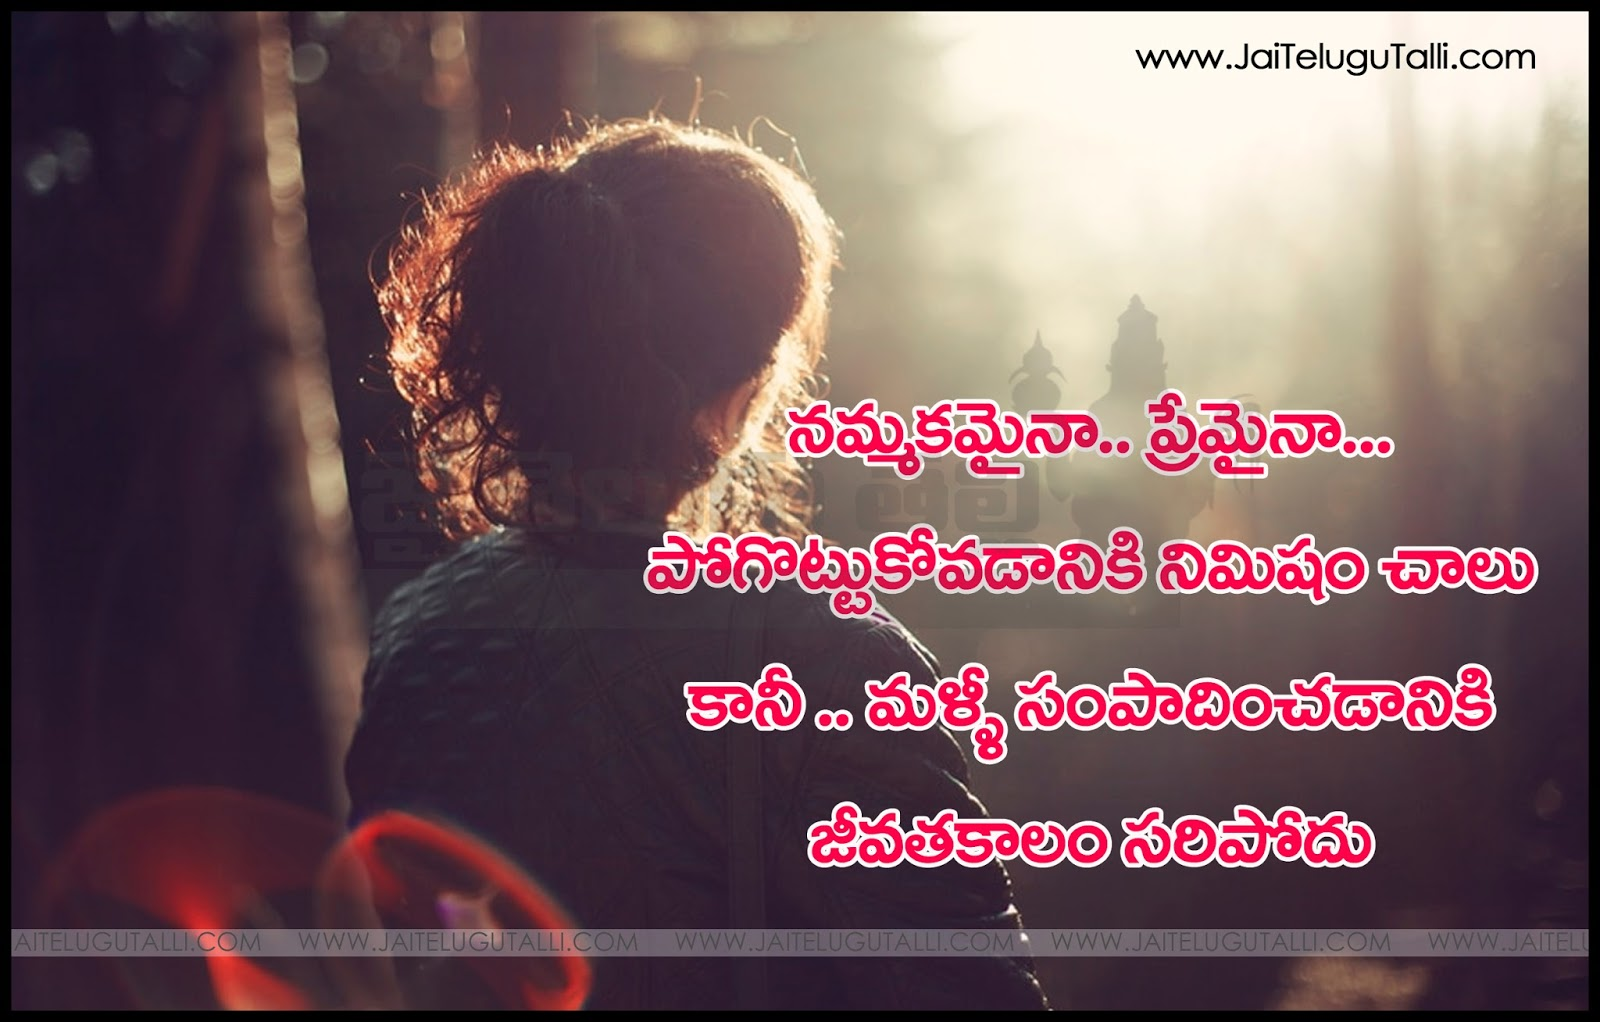 Best Quotes On Love In Telugu